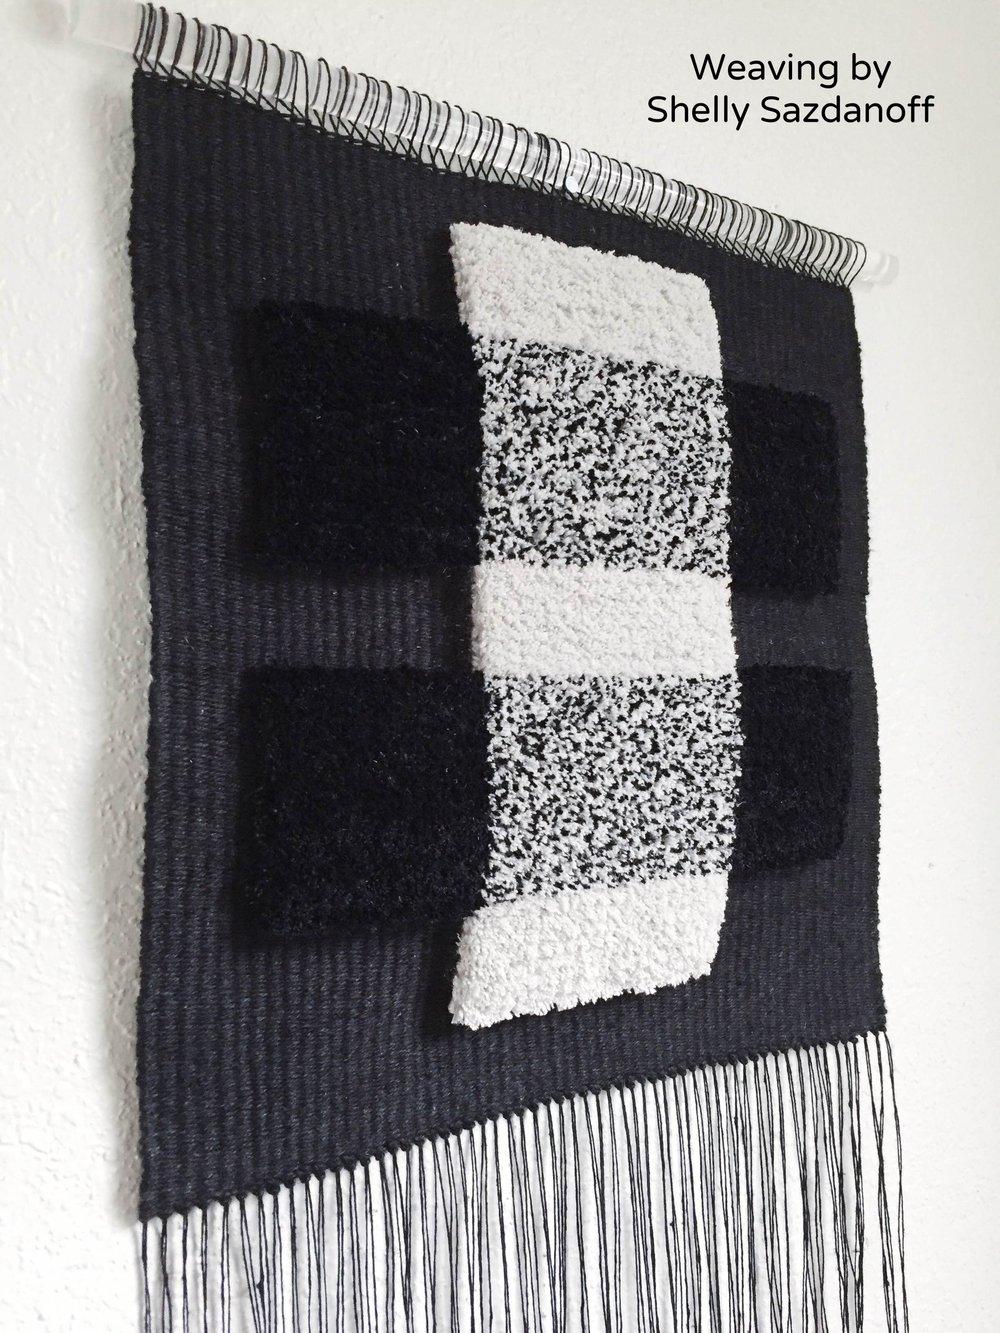 Weaving by Shelly Sazdanoff